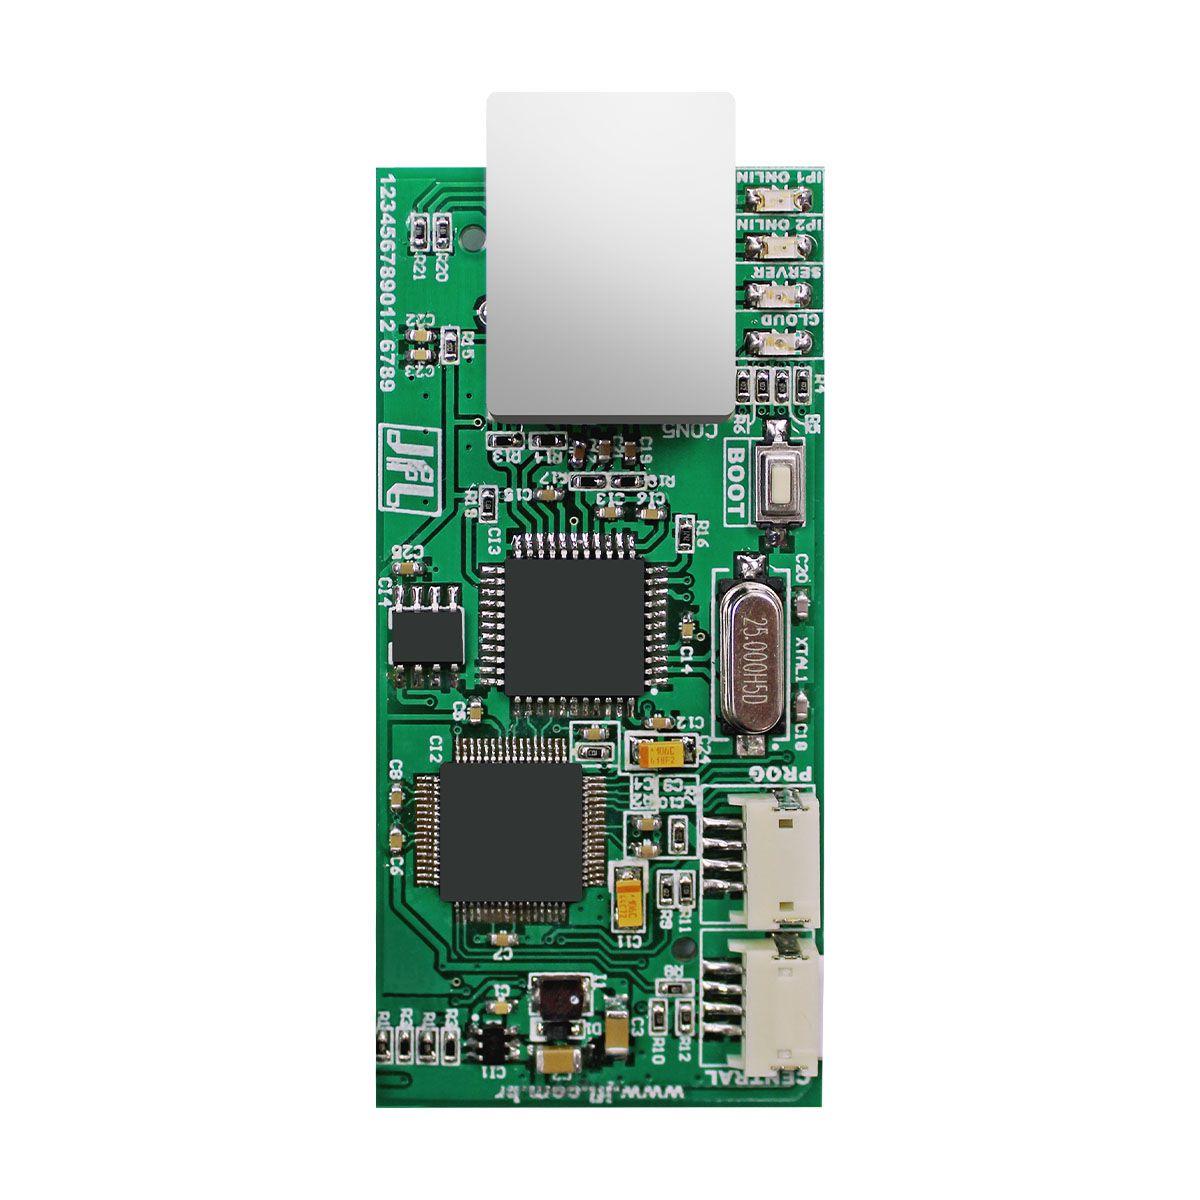 Kit Alarme Monitorado Active 32 Duo Sensor Ird 650 E Sl 220 Duo Jfl